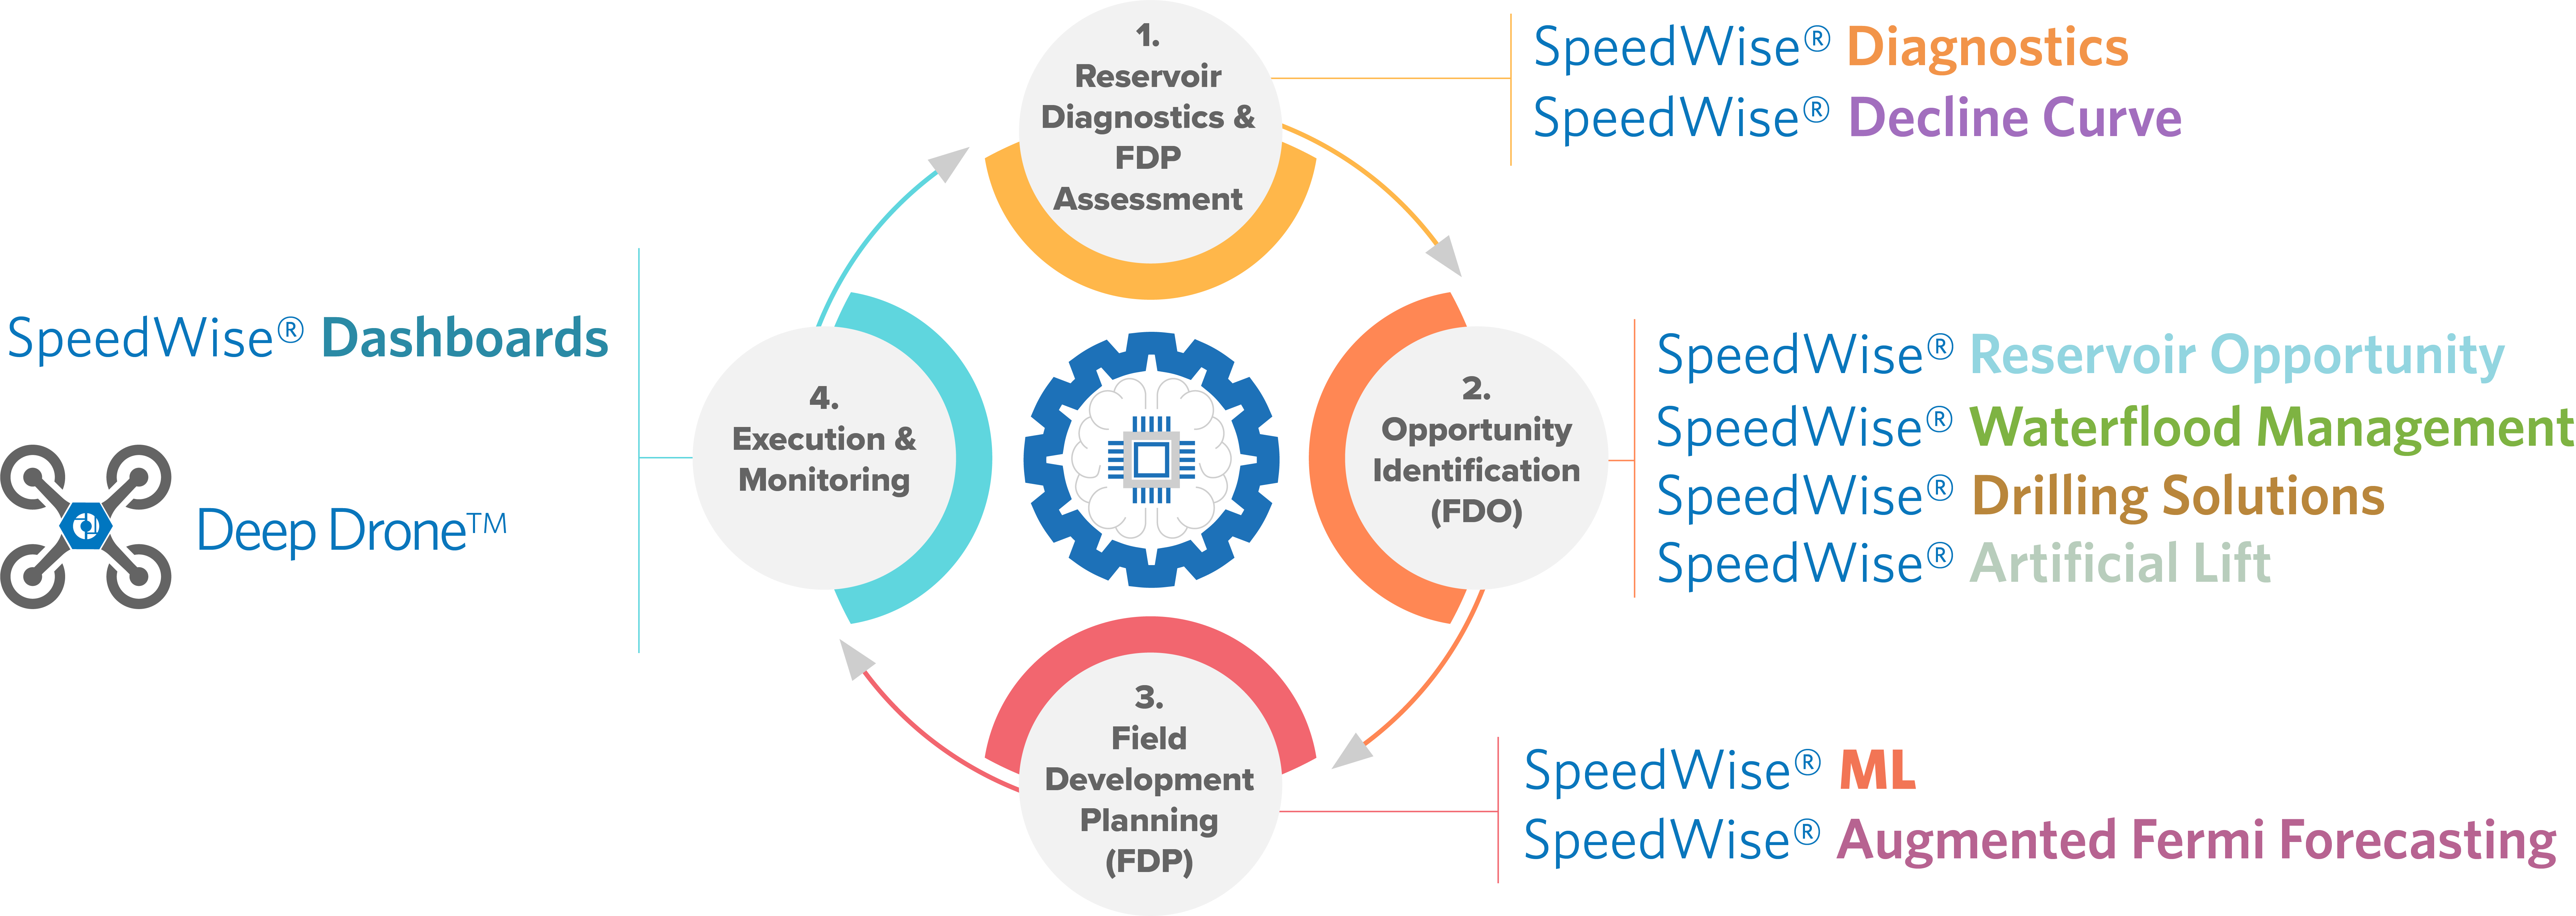 SpeedWise Galaxy - Reservoir Management Platform